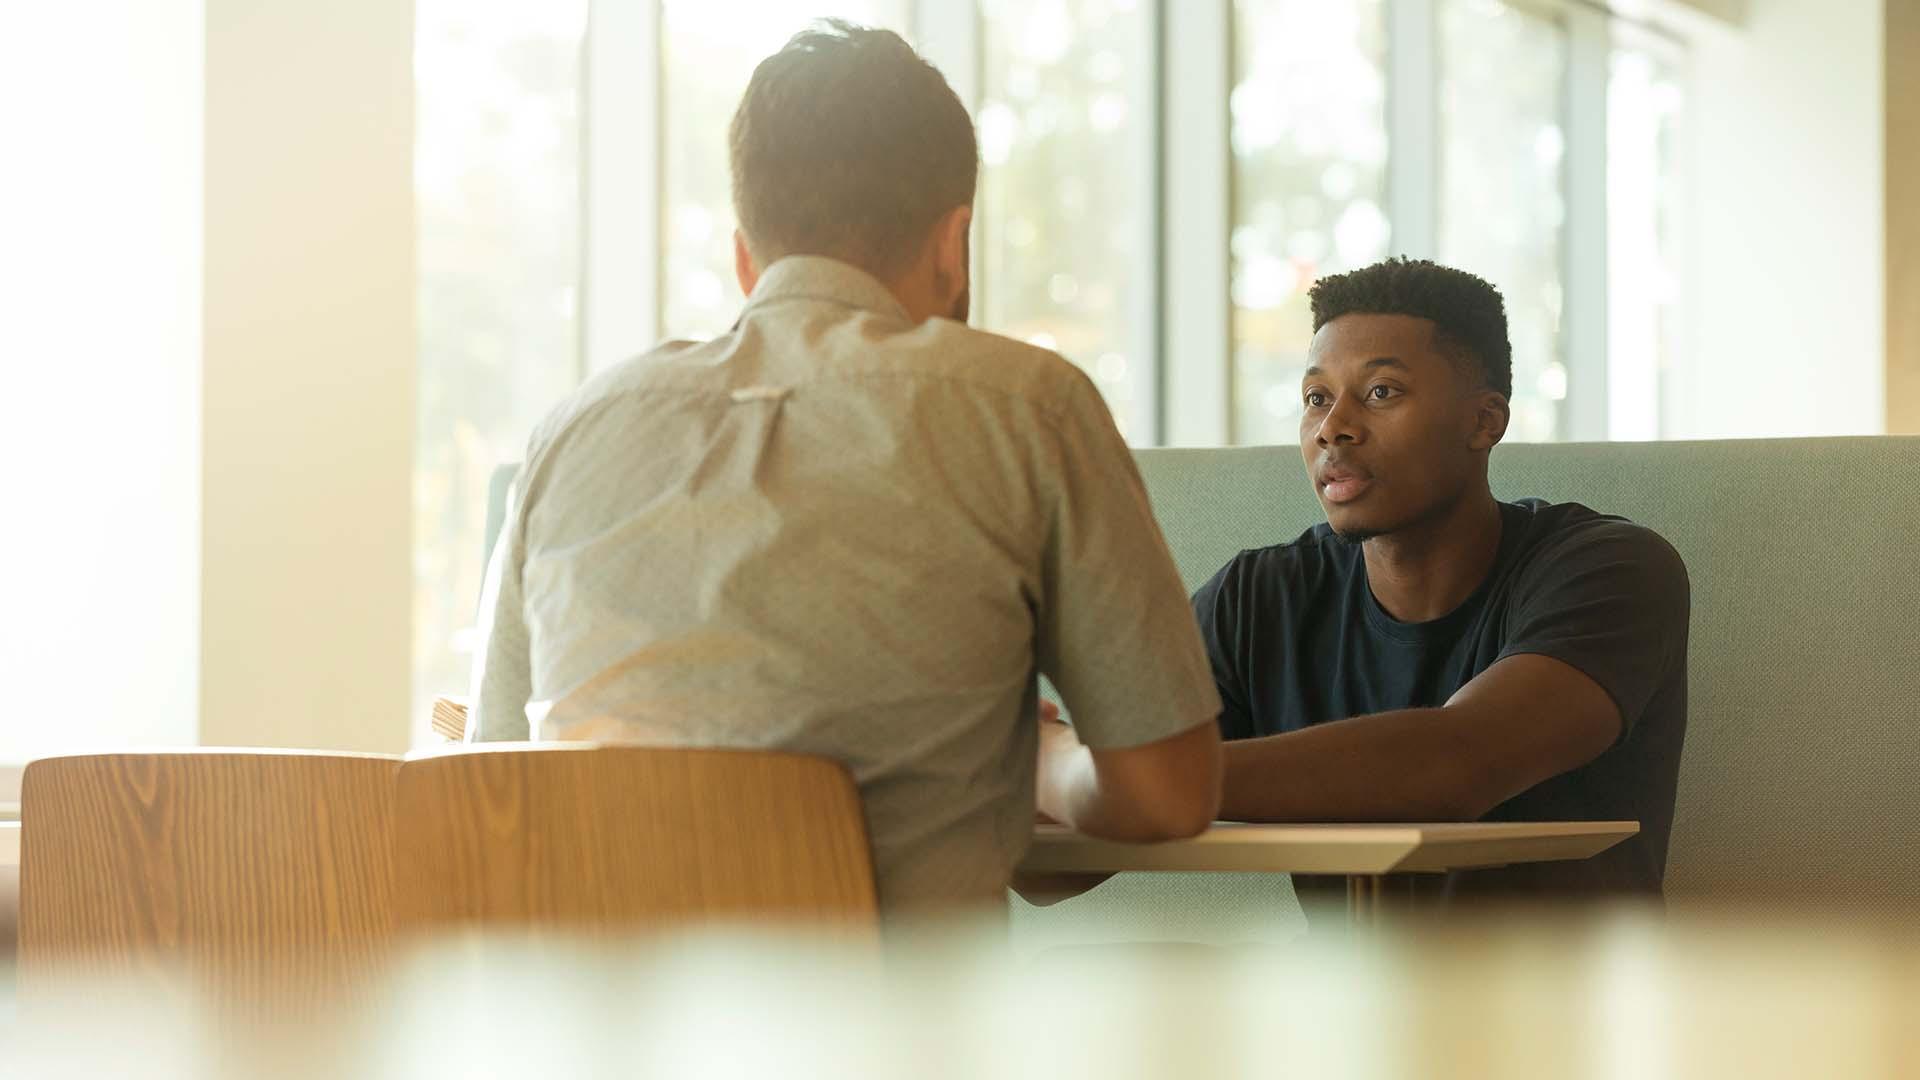 How Biblical Is Biblical Counseling